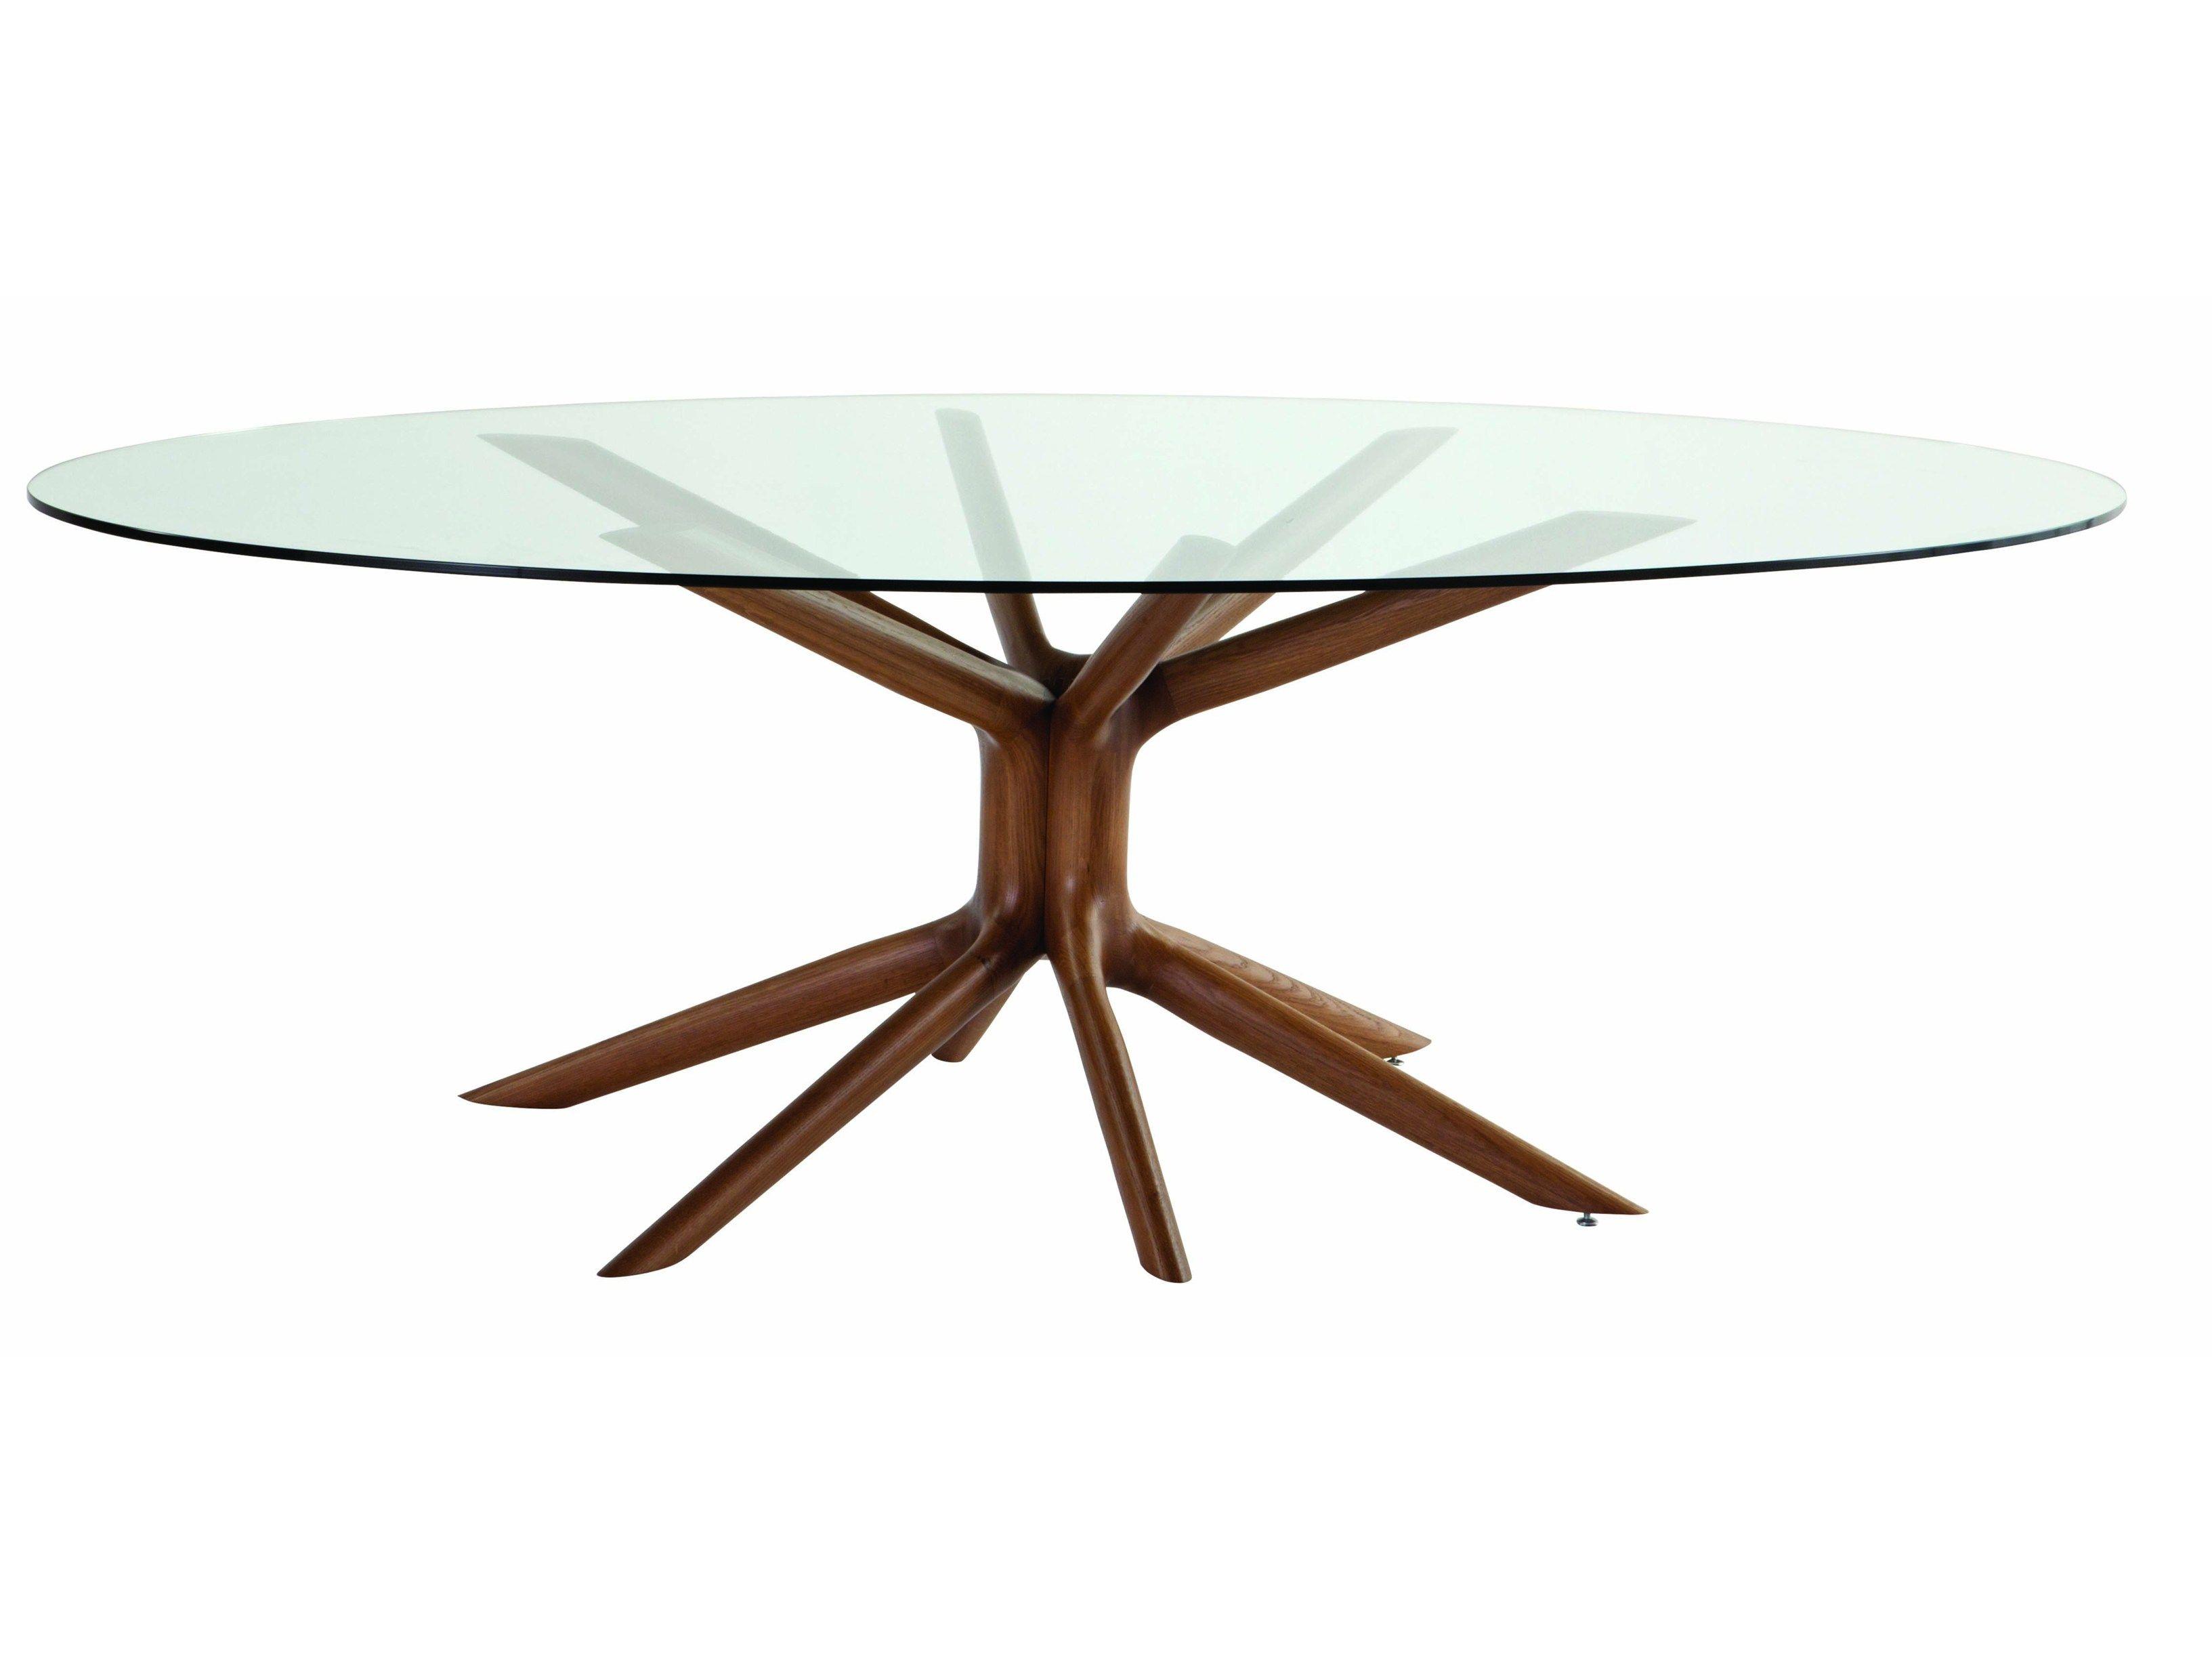 mesa de jantar oval de vidro mangrove by roche bobois design antoine fritsch vivien durisotti. Black Bedroom Furniture Sets. Home Design Ideas